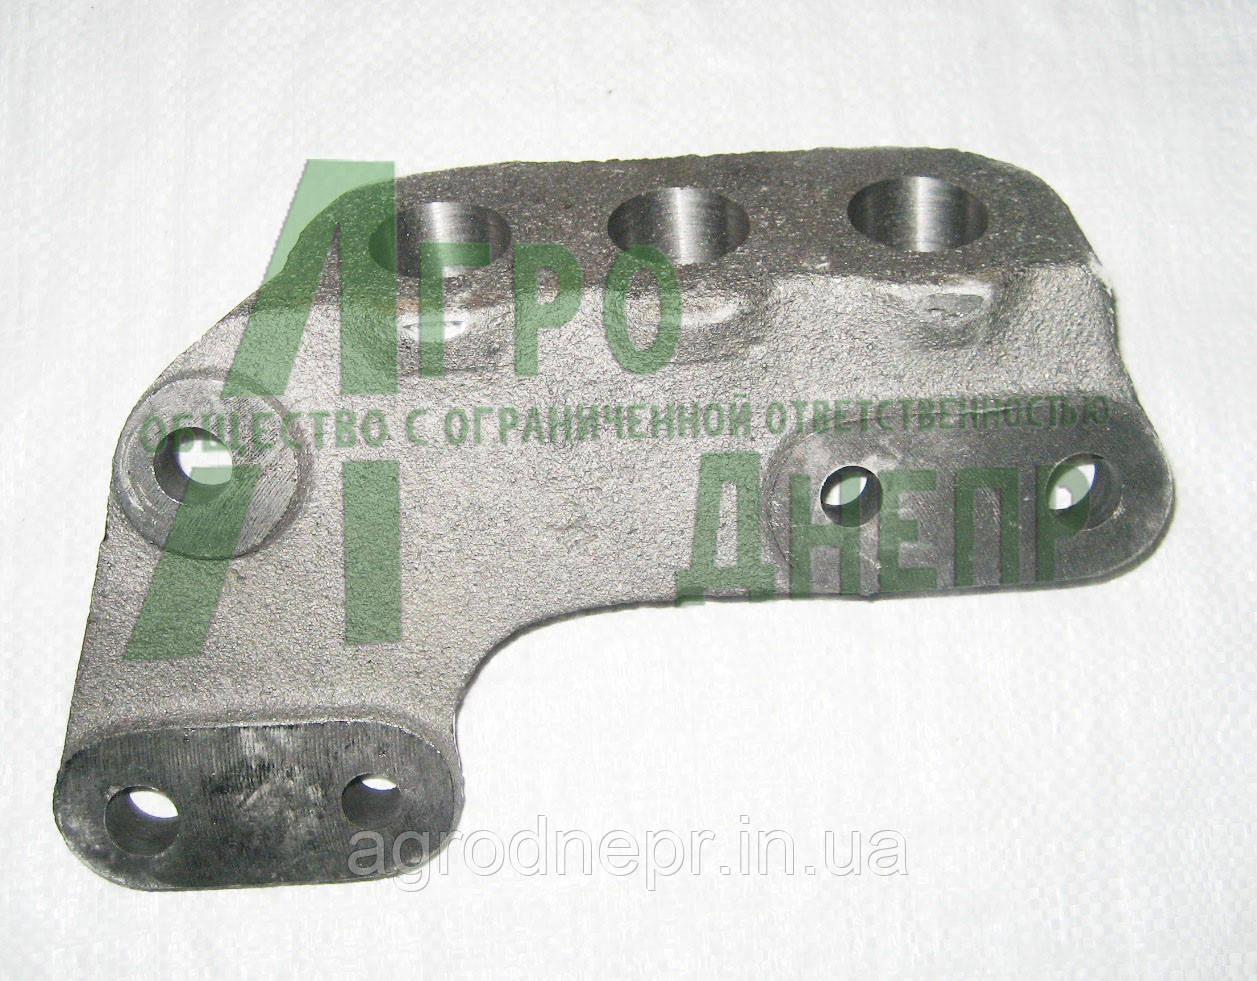 Кронштейн гидроцилиндра поворота Ц-50 на трактор МТЗ-82 102-2301023-01